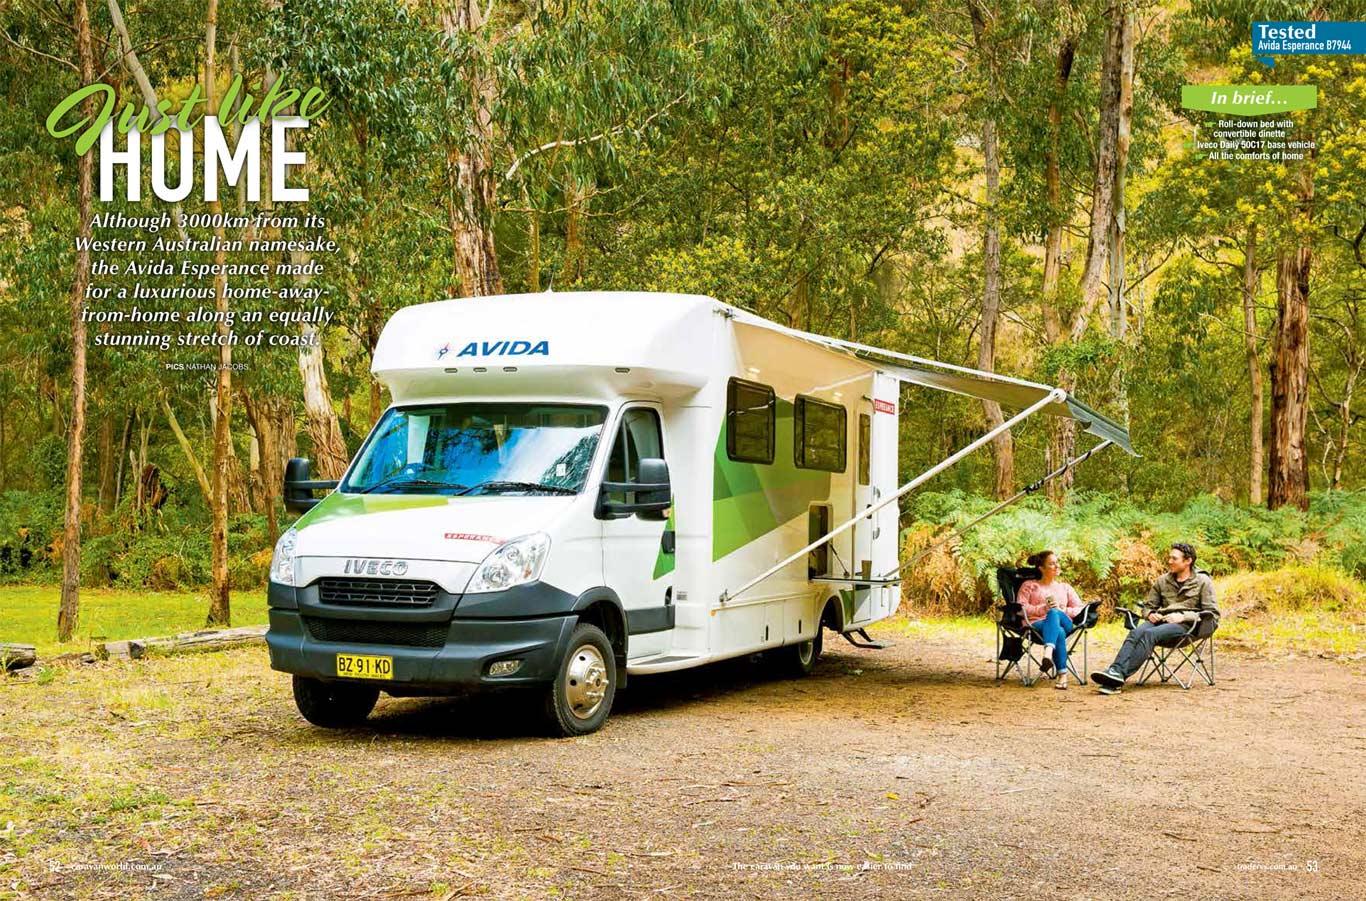 2015 B7944 Esperance Motorhome Review - Avida RV